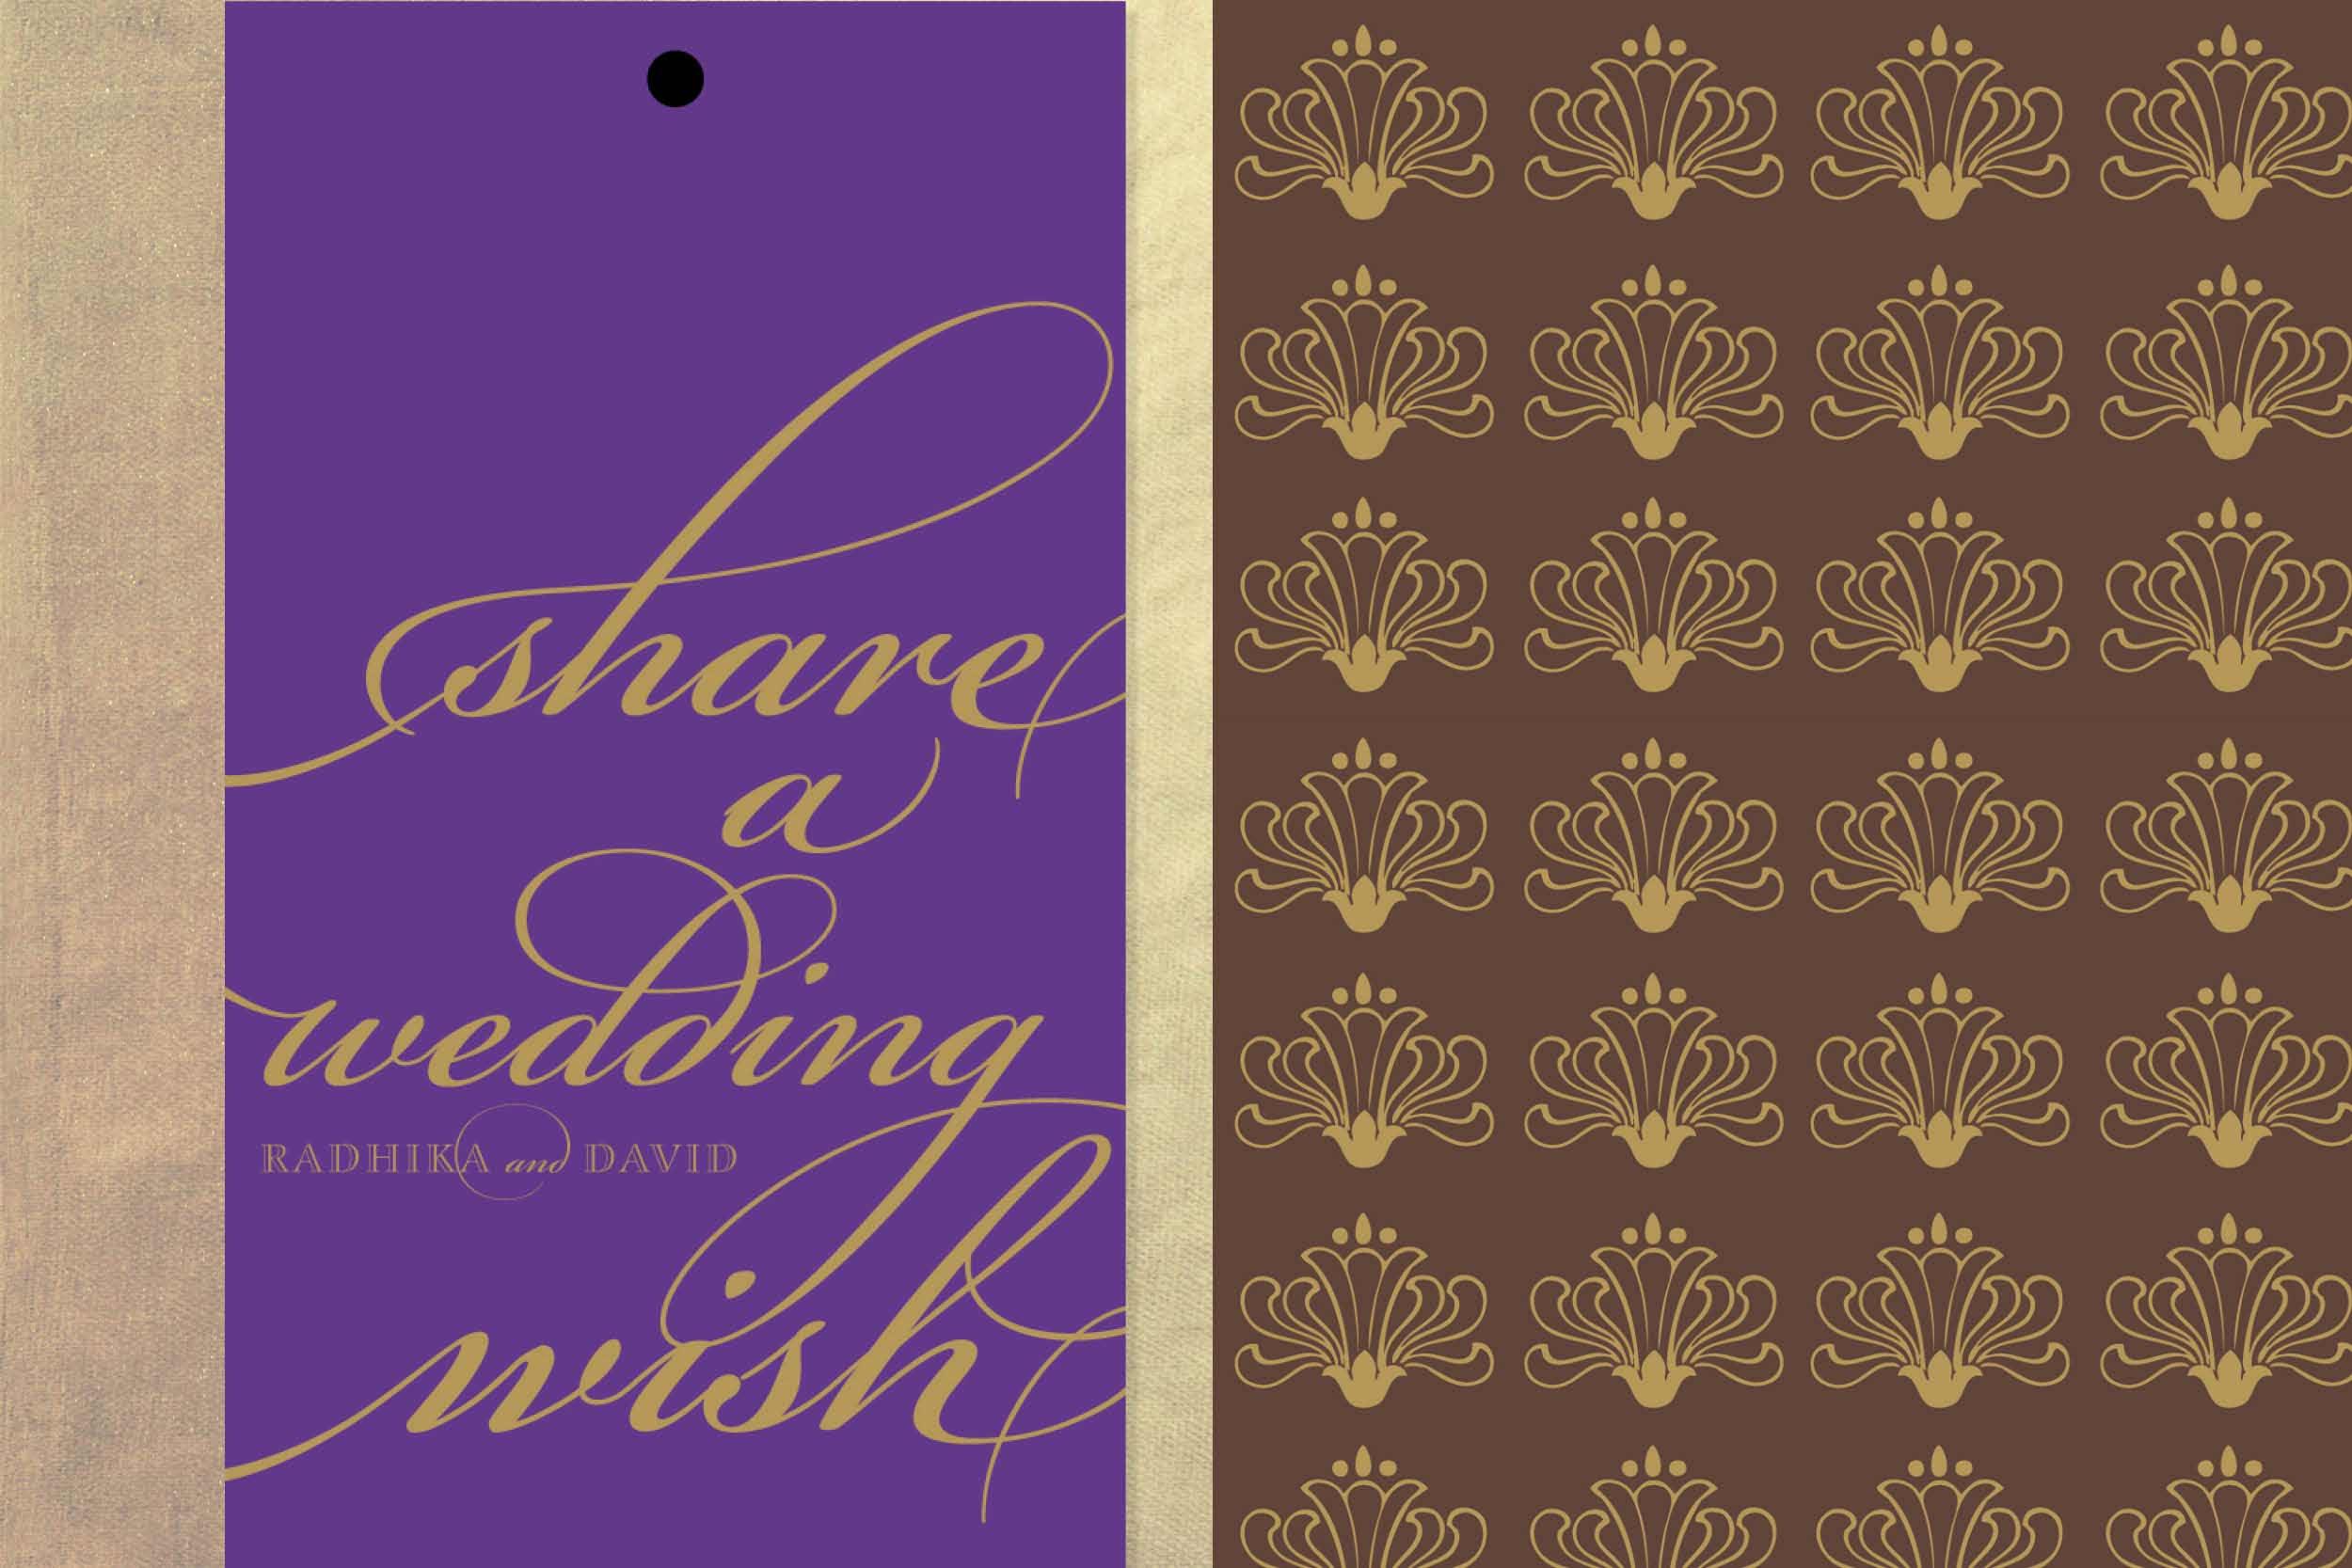 lily_bespoke_wedding_stationery_ananycards.com-04.jpg